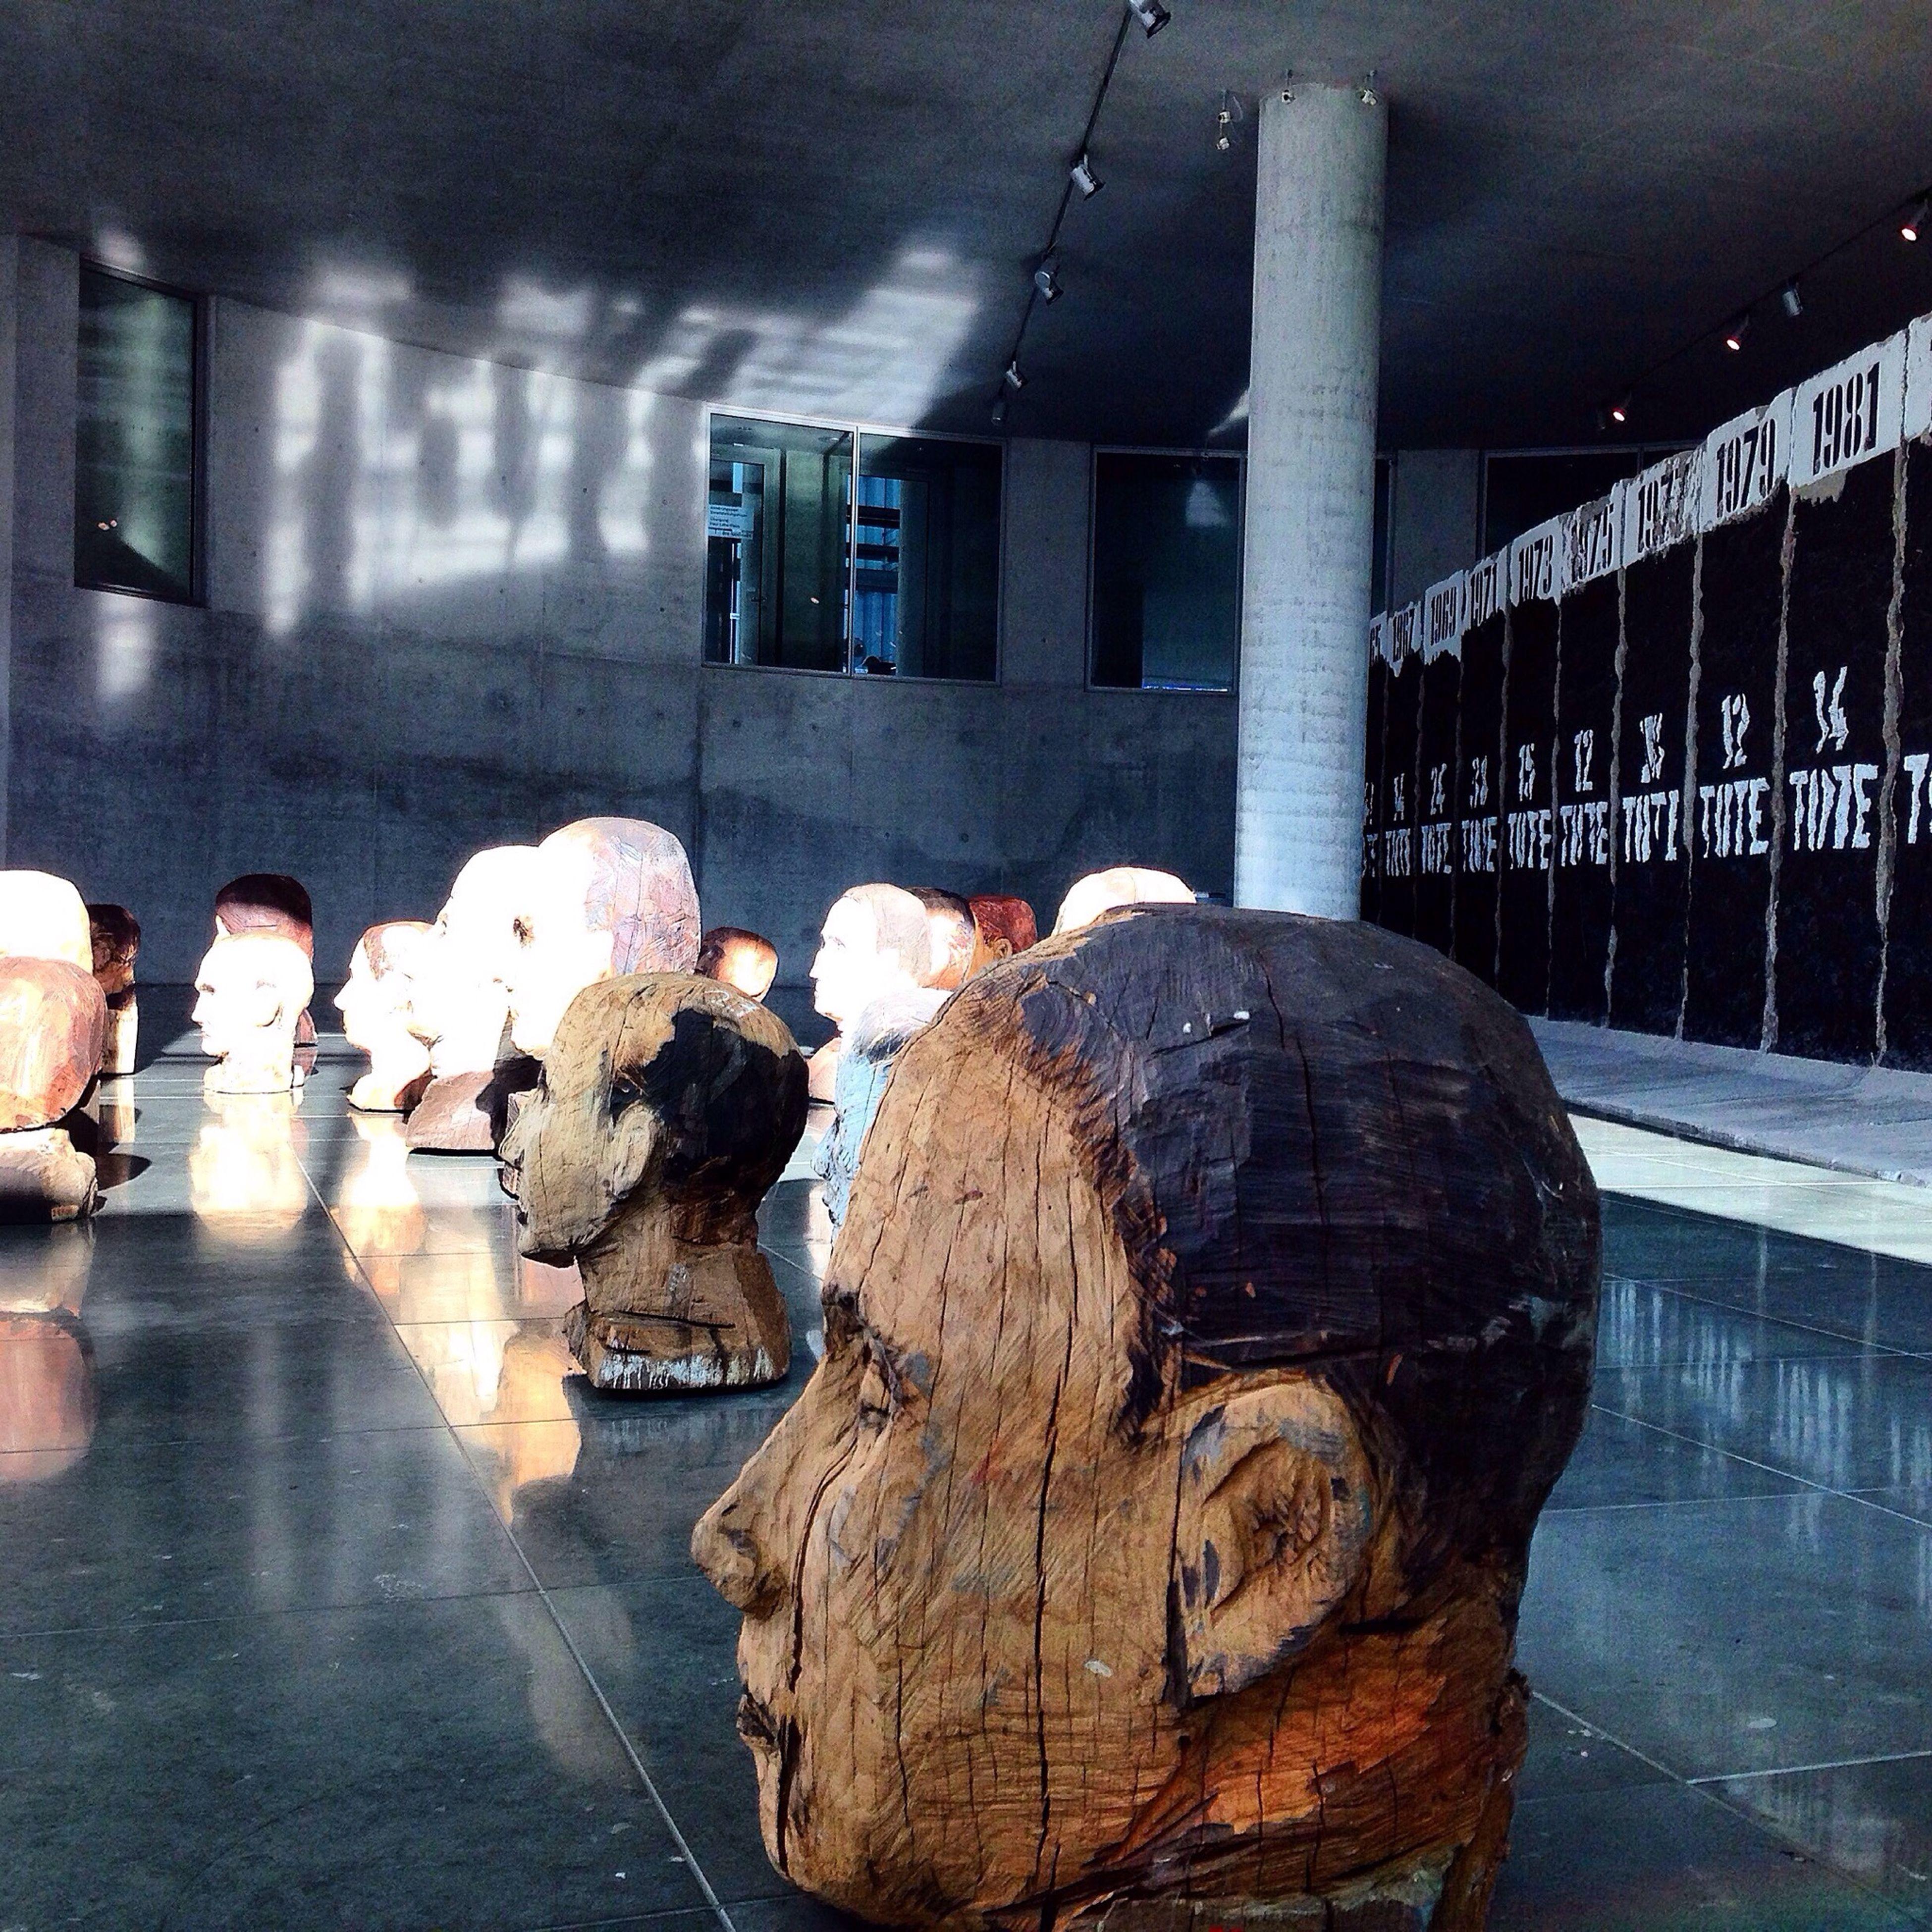 Berlin Wall Memorial Bundestag